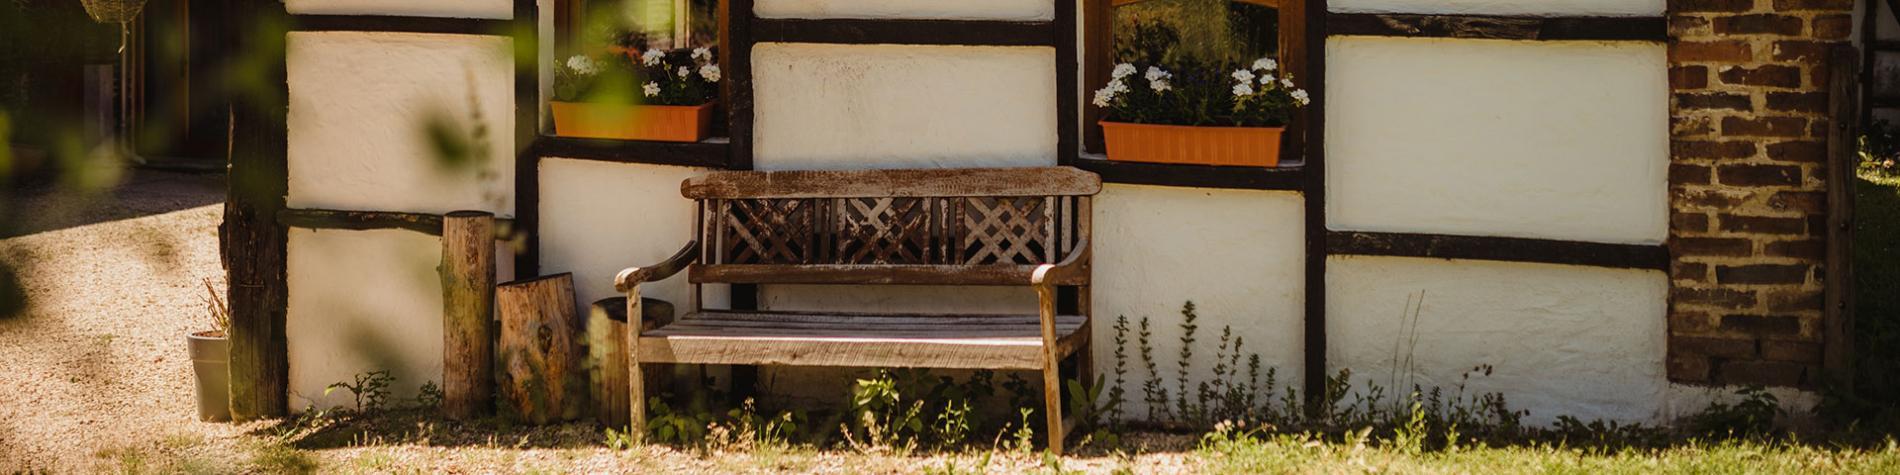 Gîte rural - La Bushaye - Le Studio - Aubel